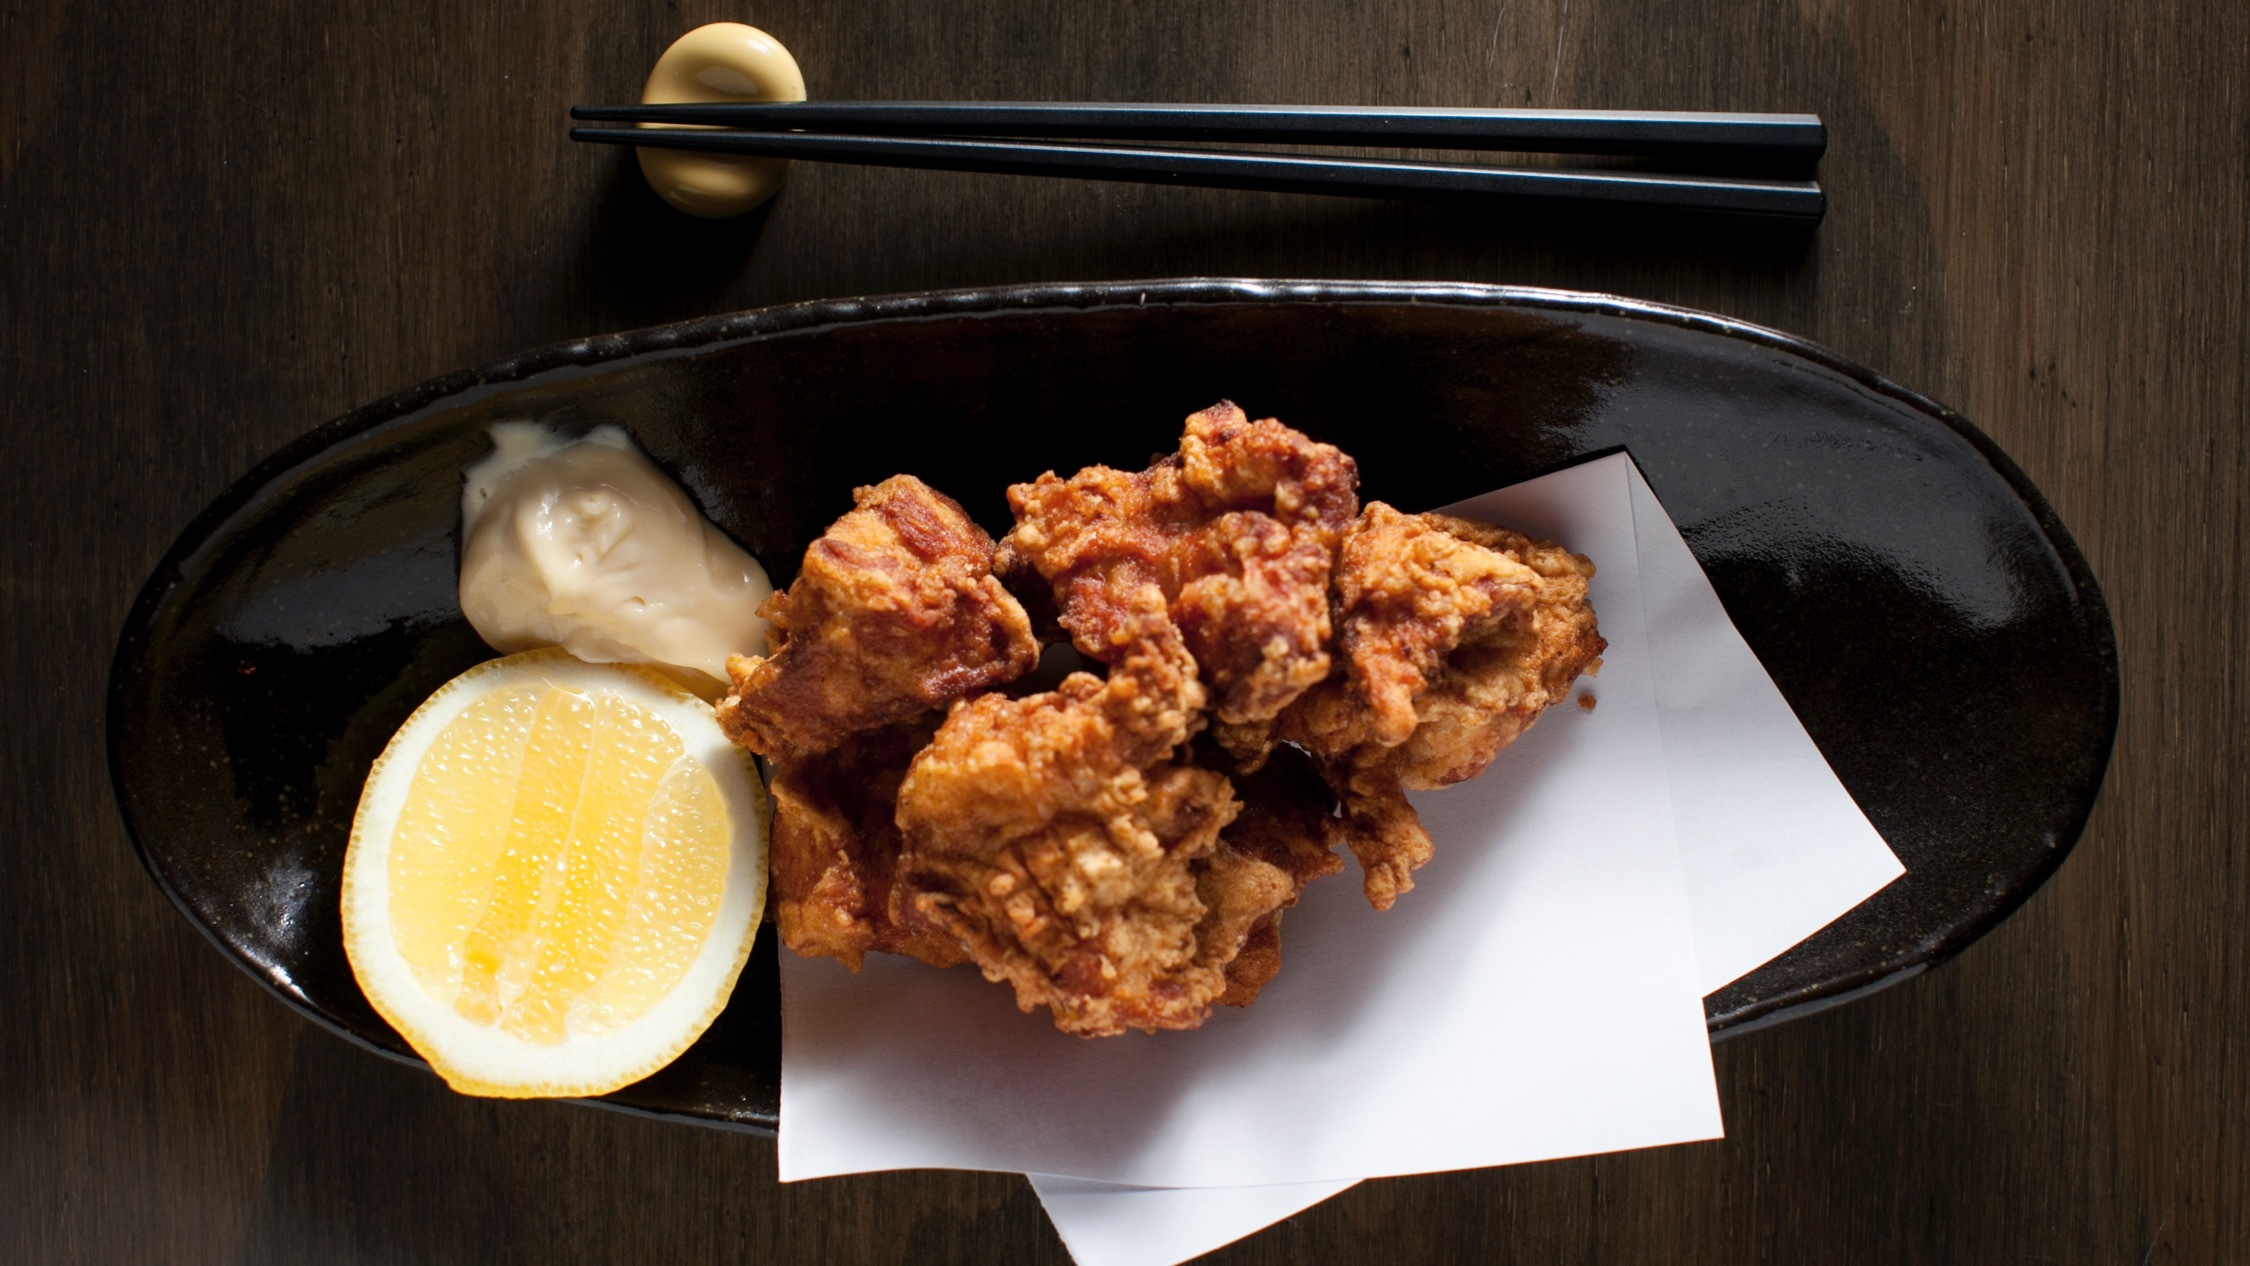 Food at Izakaya Fujiyama